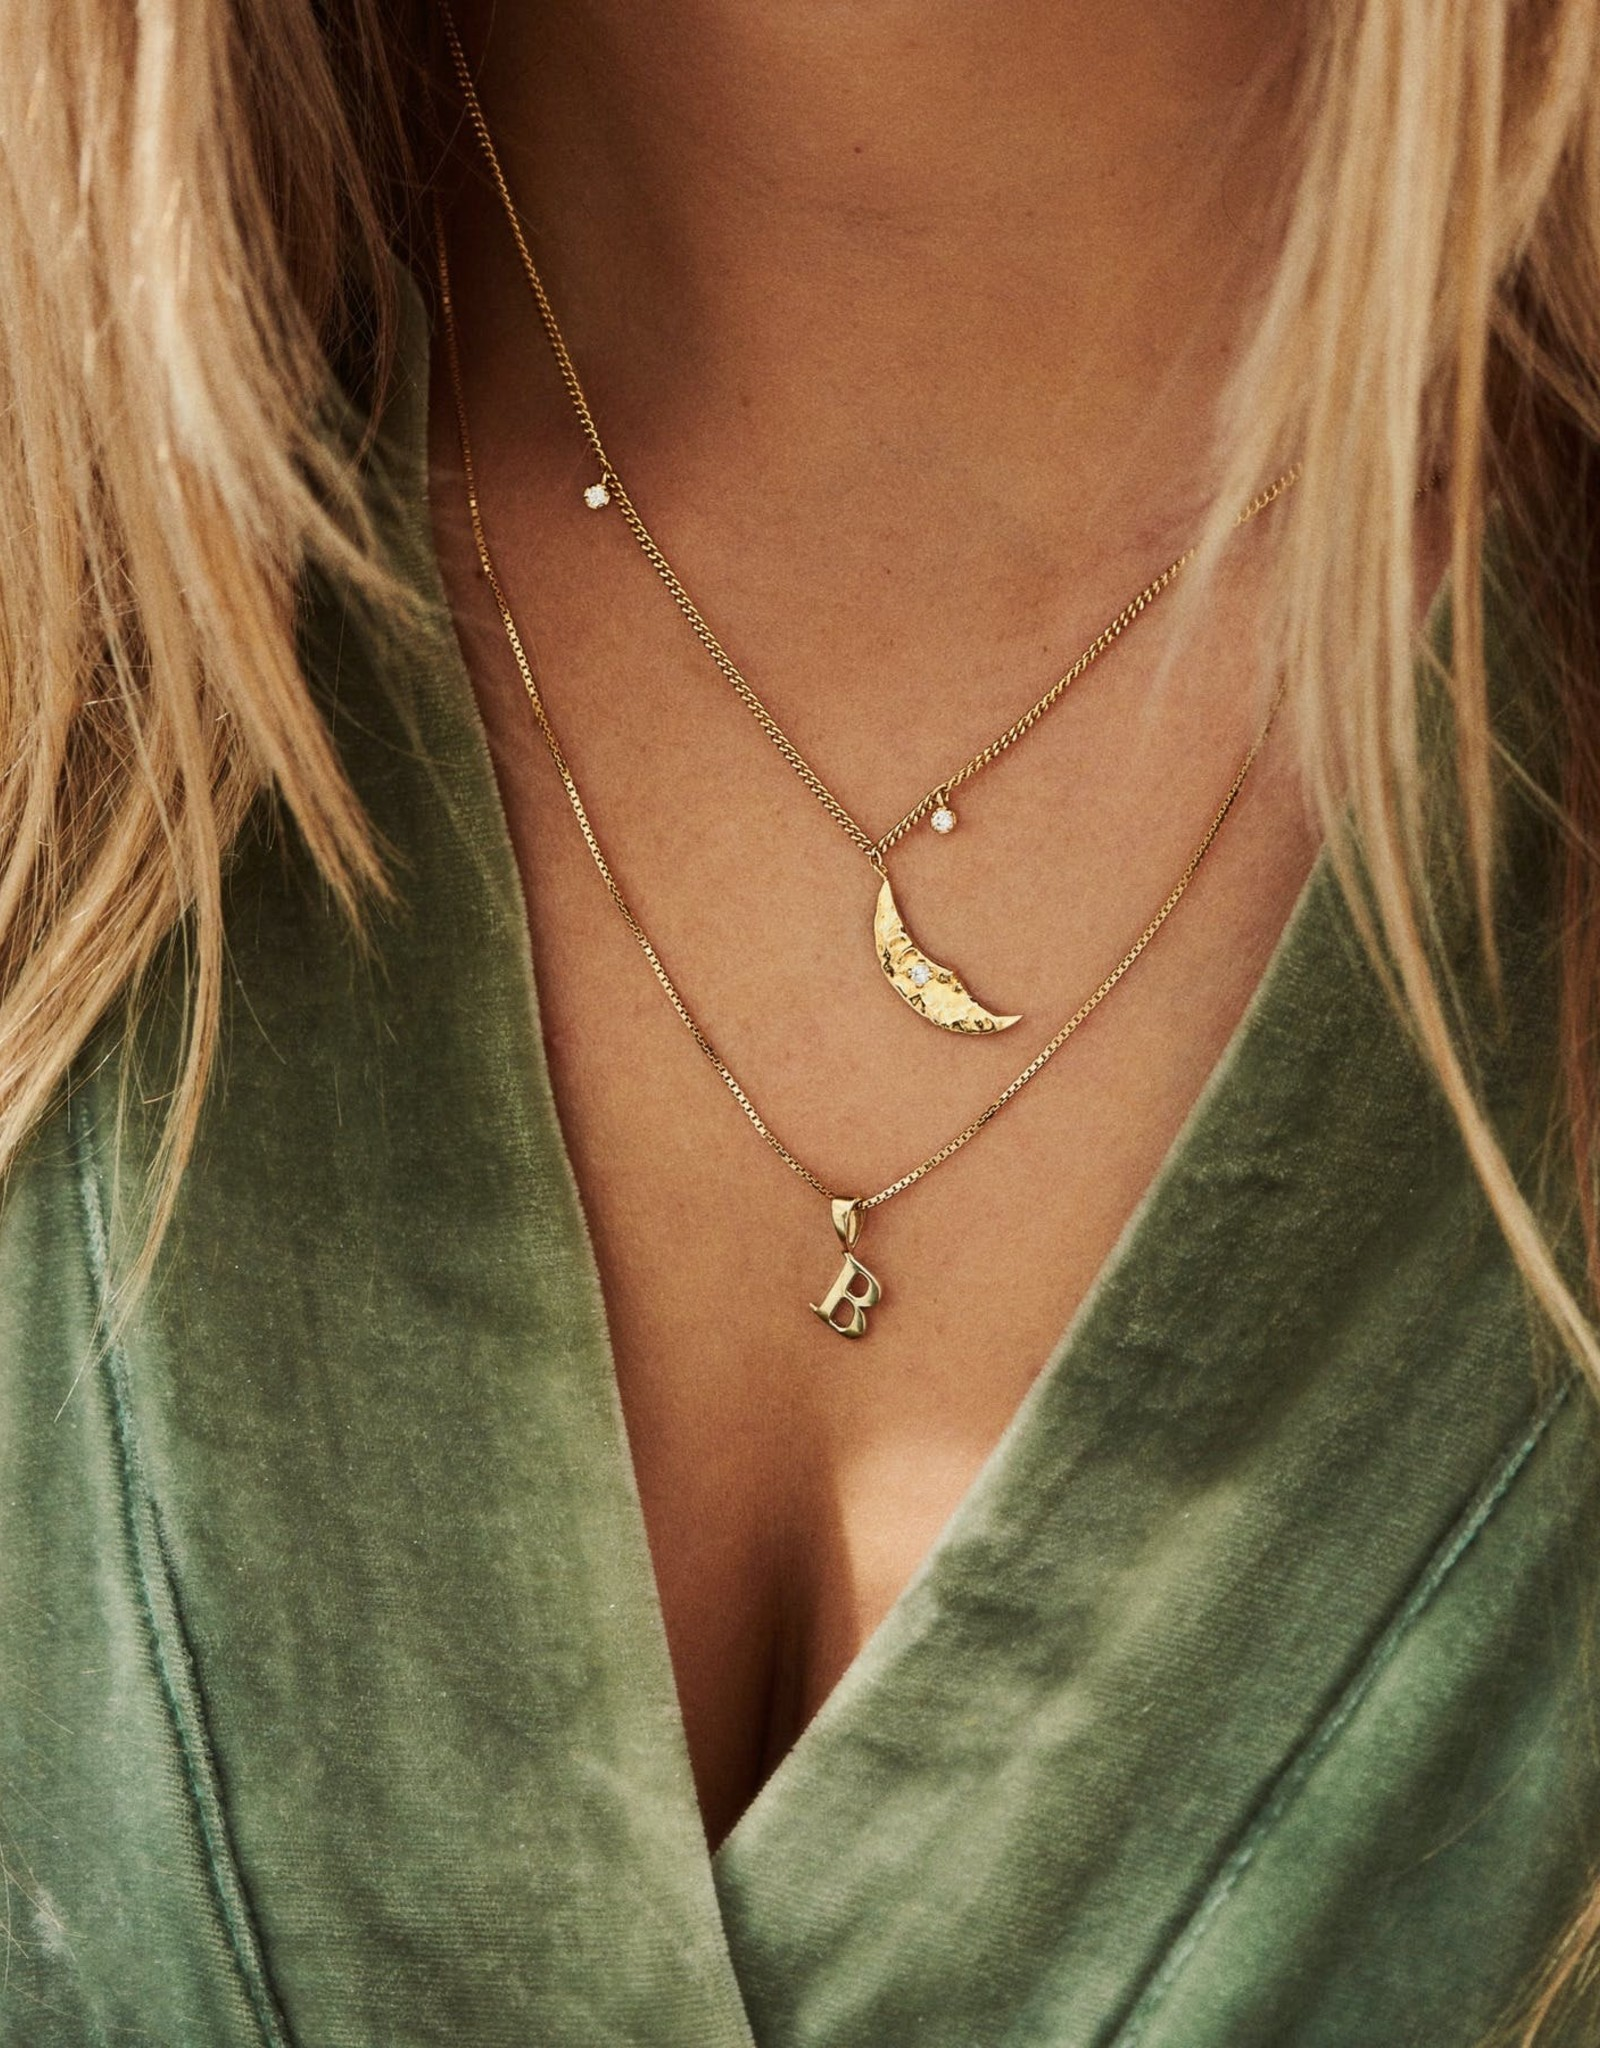 Anna+Nina A+N- Initial Necklace Charm